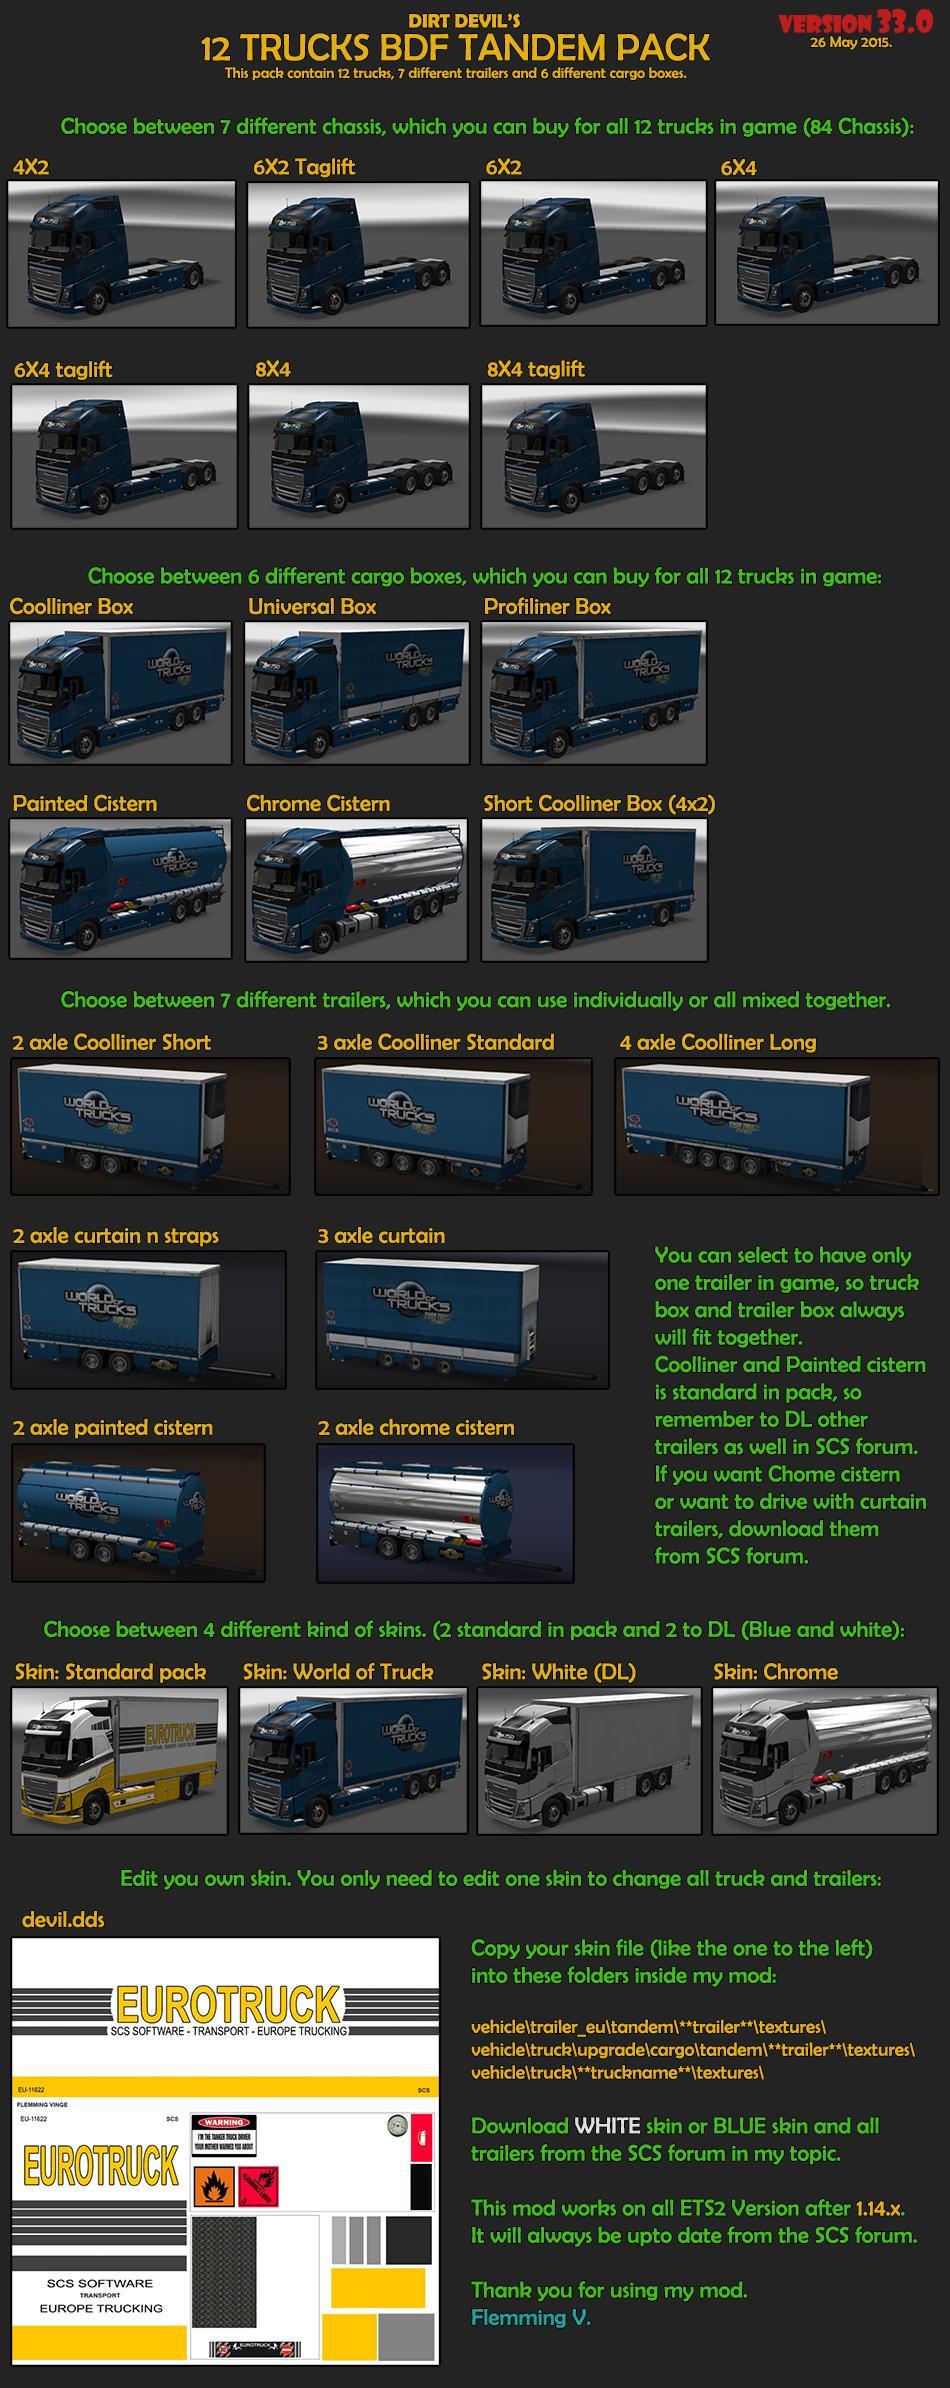 bdf-tandem-truck-pack-v33_2